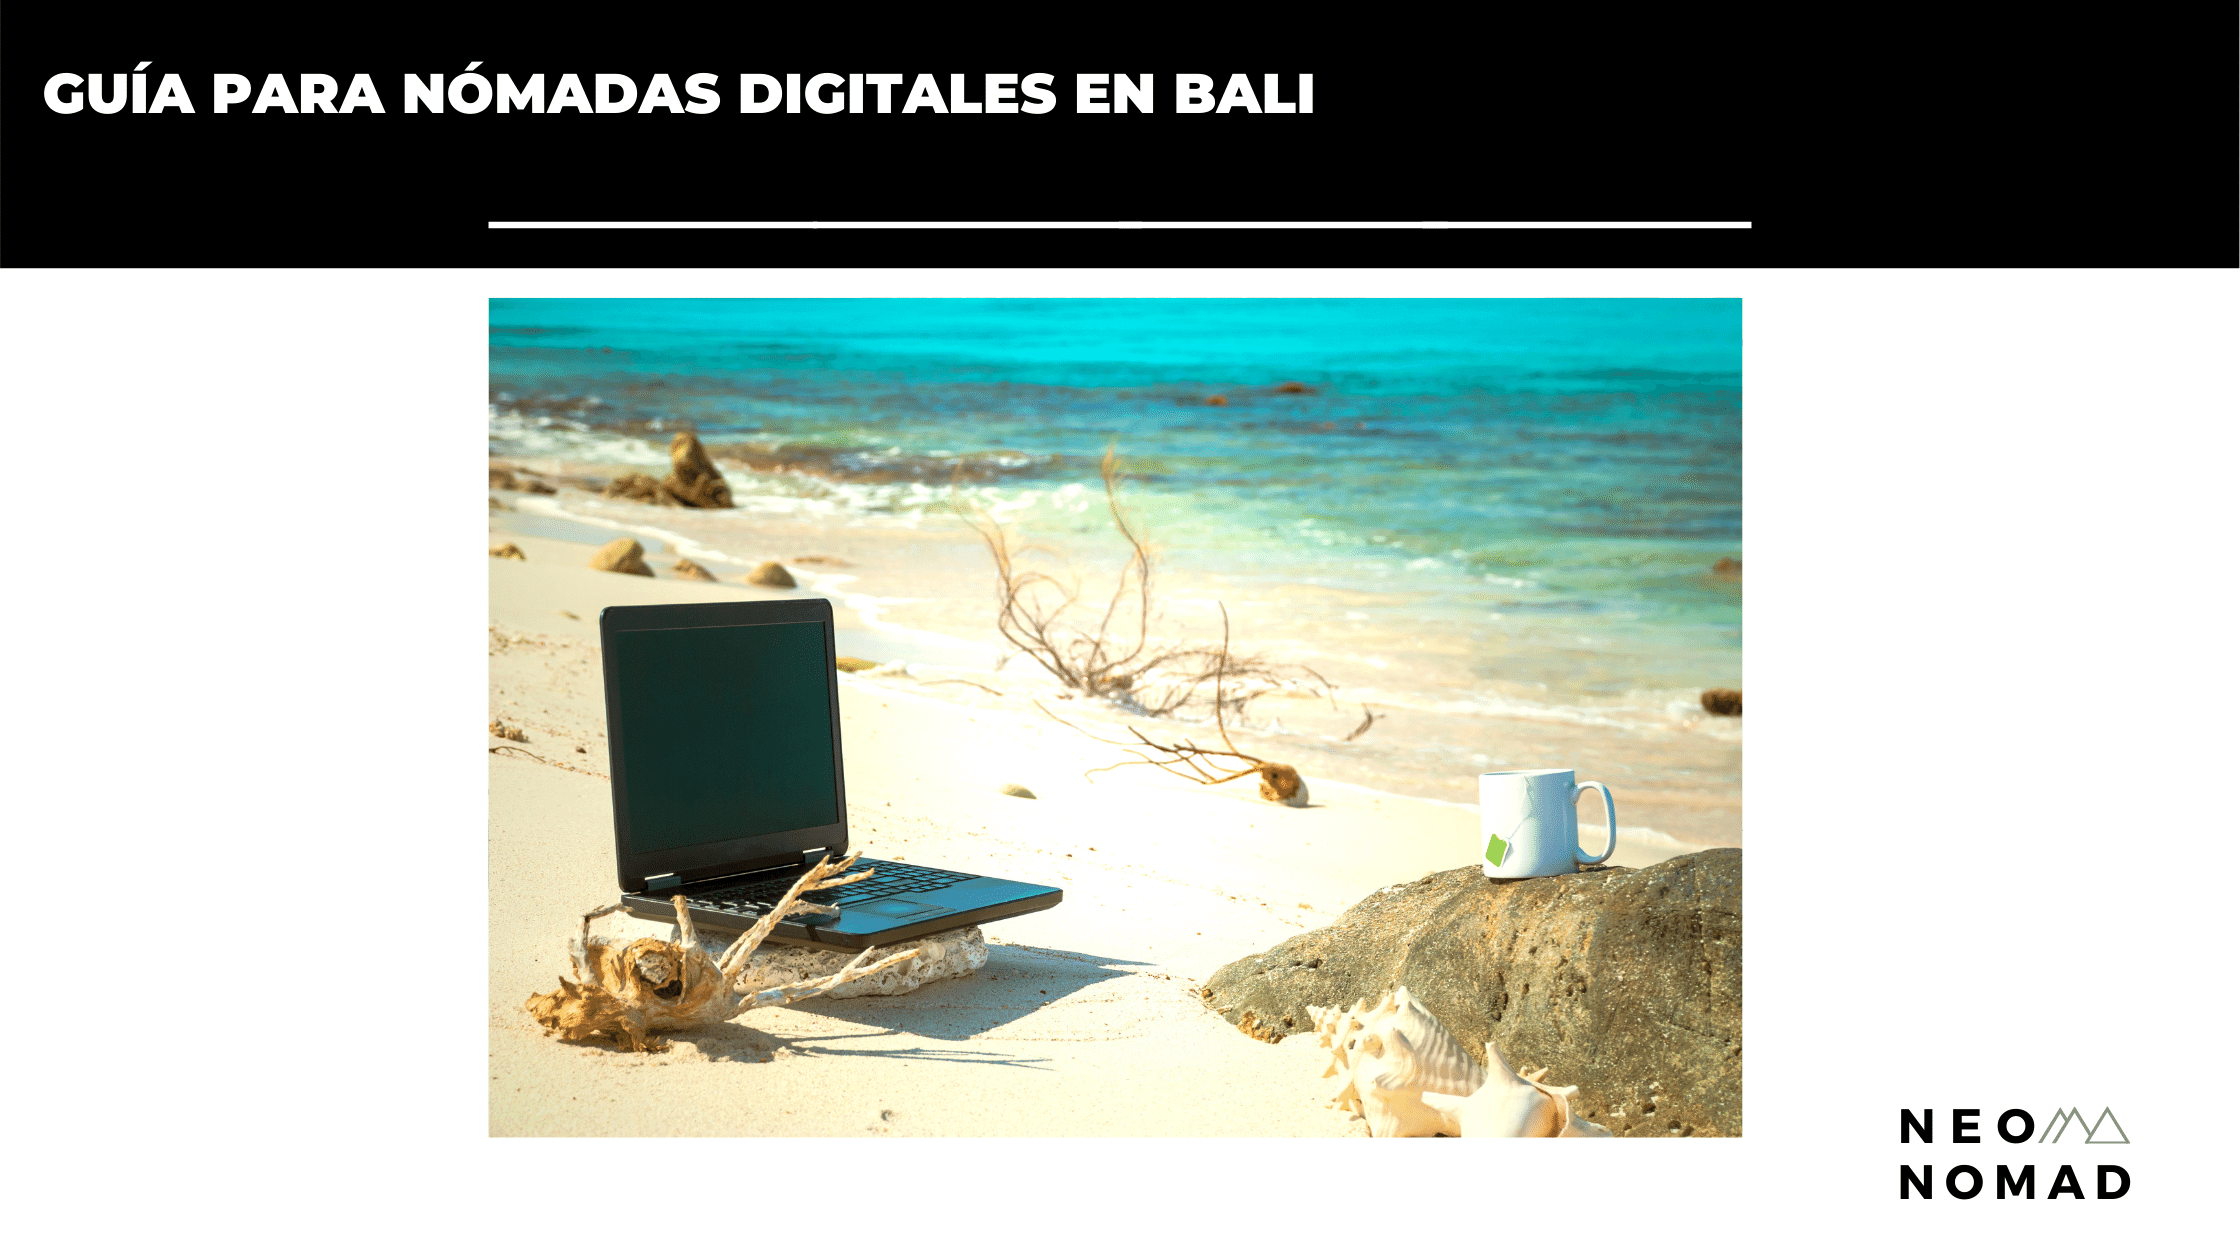 Nómadas digitales en Bali